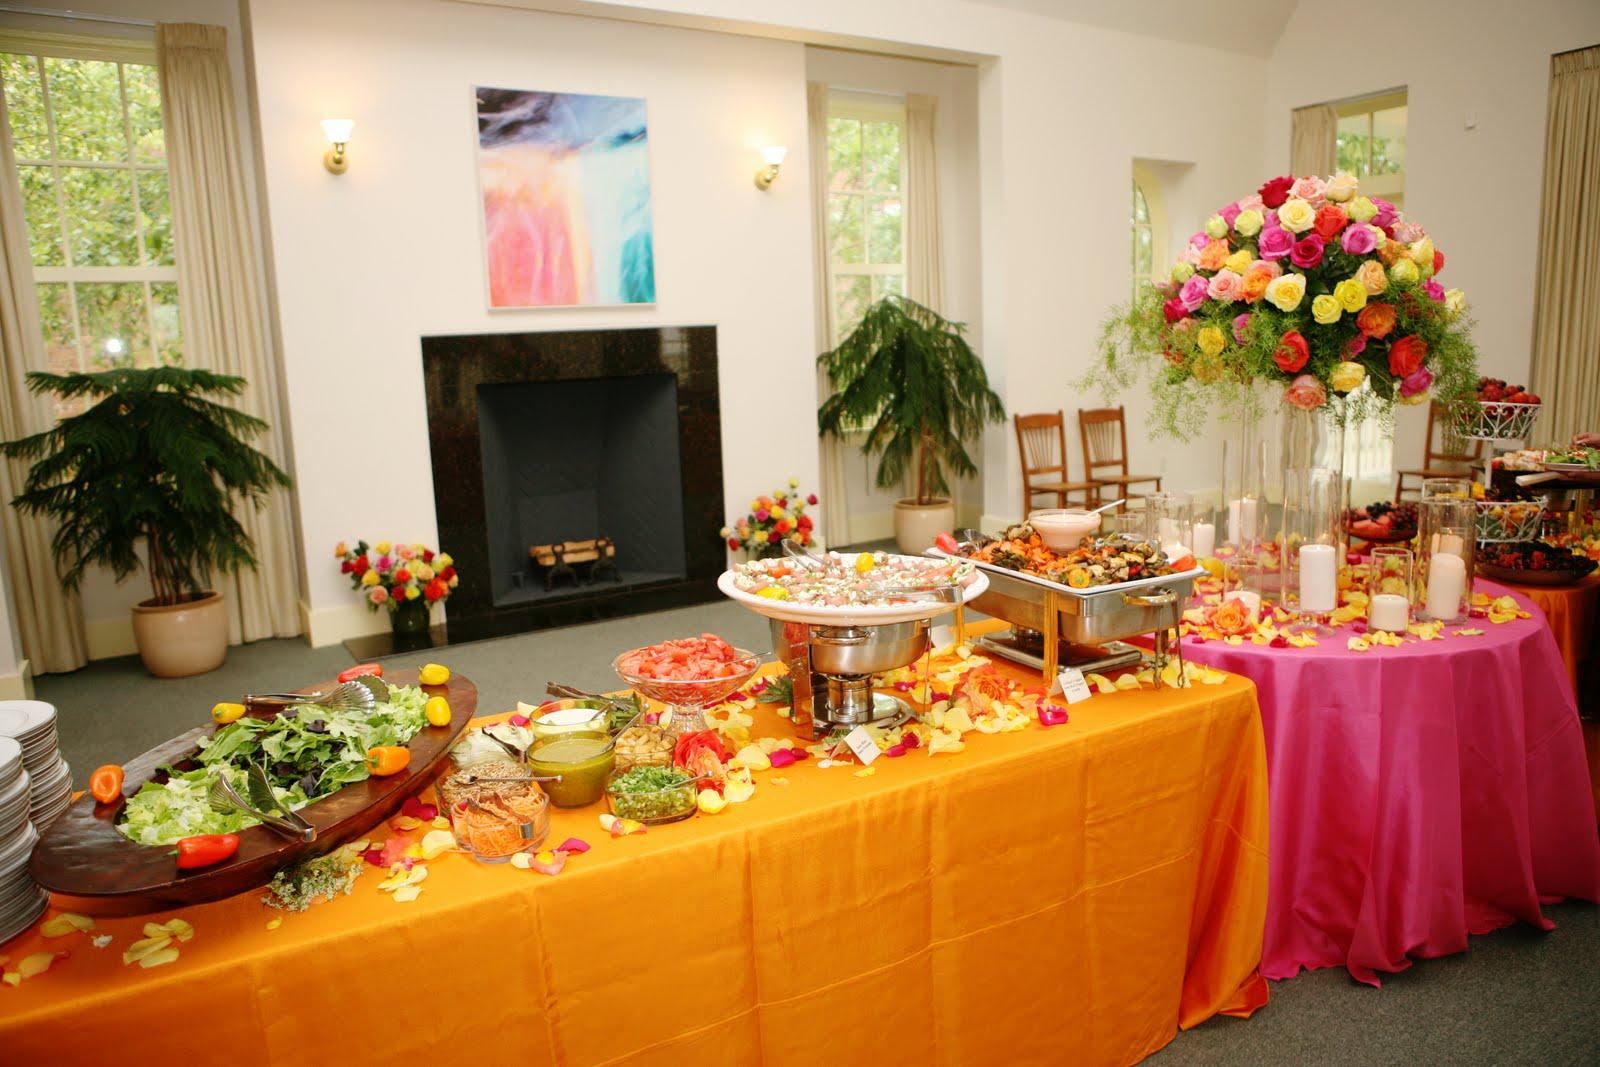 Campy Wedding Style Buffet Food Table : FloresguerraMorris347 from campyweddingstyle.blogspot.com size 1600 x 1067 jpeg 217kB